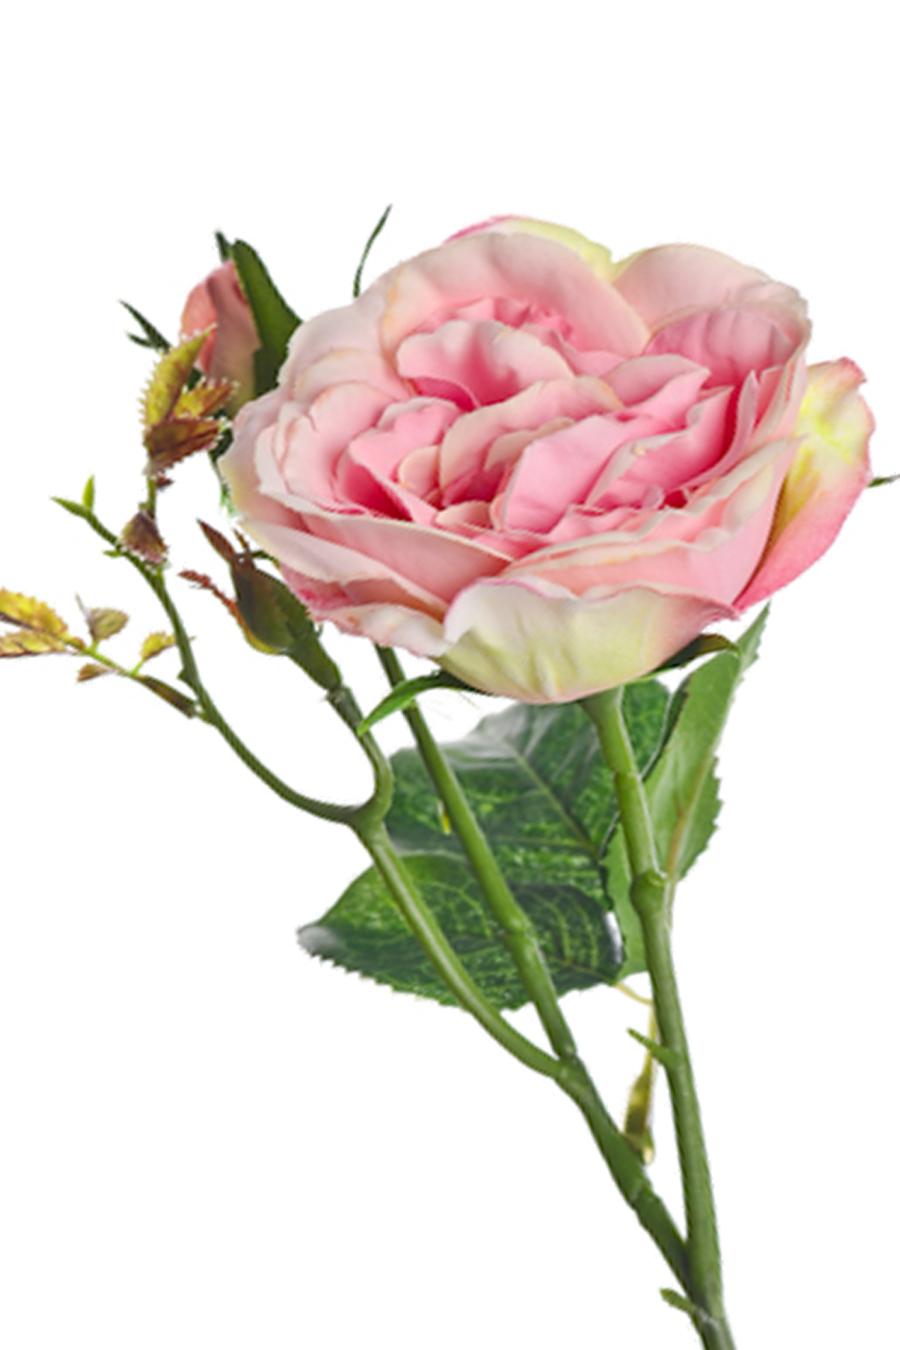 Rose pale pink 3 silk flowers artificial arrangements pene dene rose pale pink 3 silk flowers artificial flower arrangement mightylinksfo